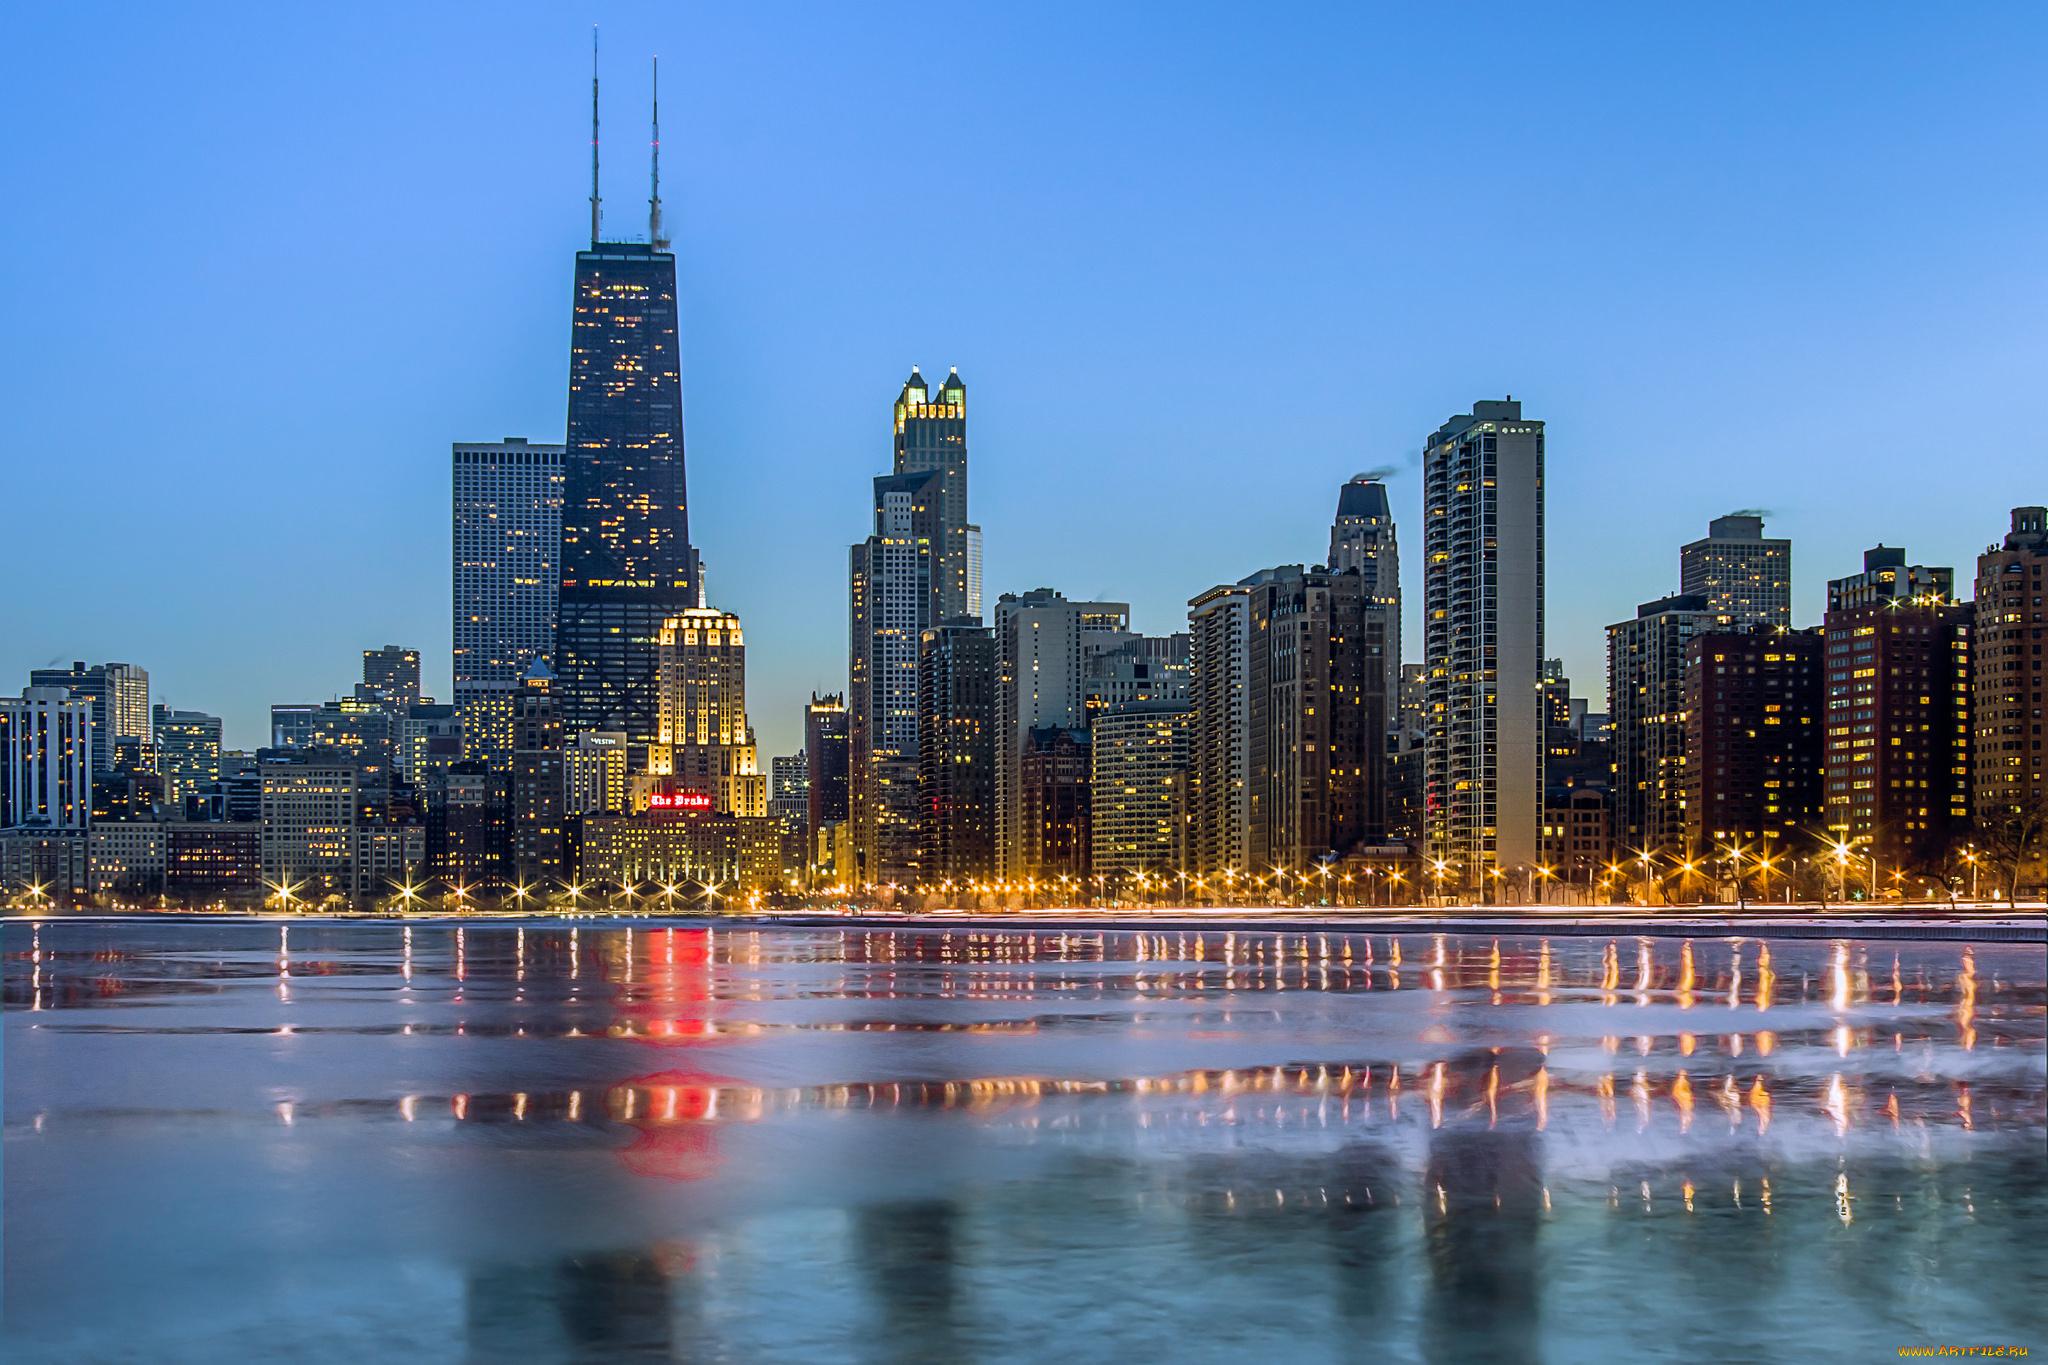 чикаго огни город Chicago lights the city бесплатно